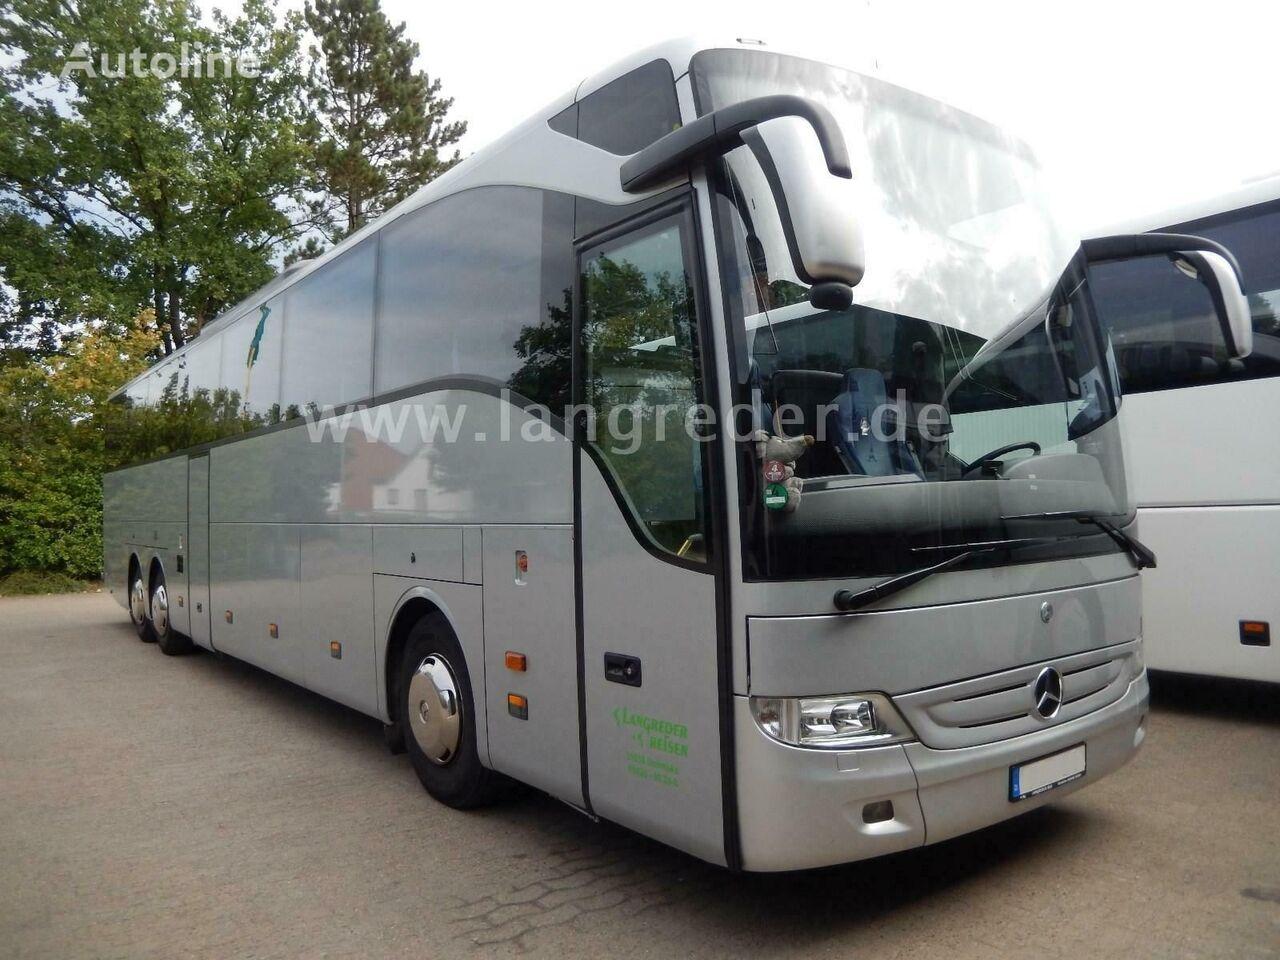 MERCEDES-BENZ Tourismo RHD-L autobús de turismo